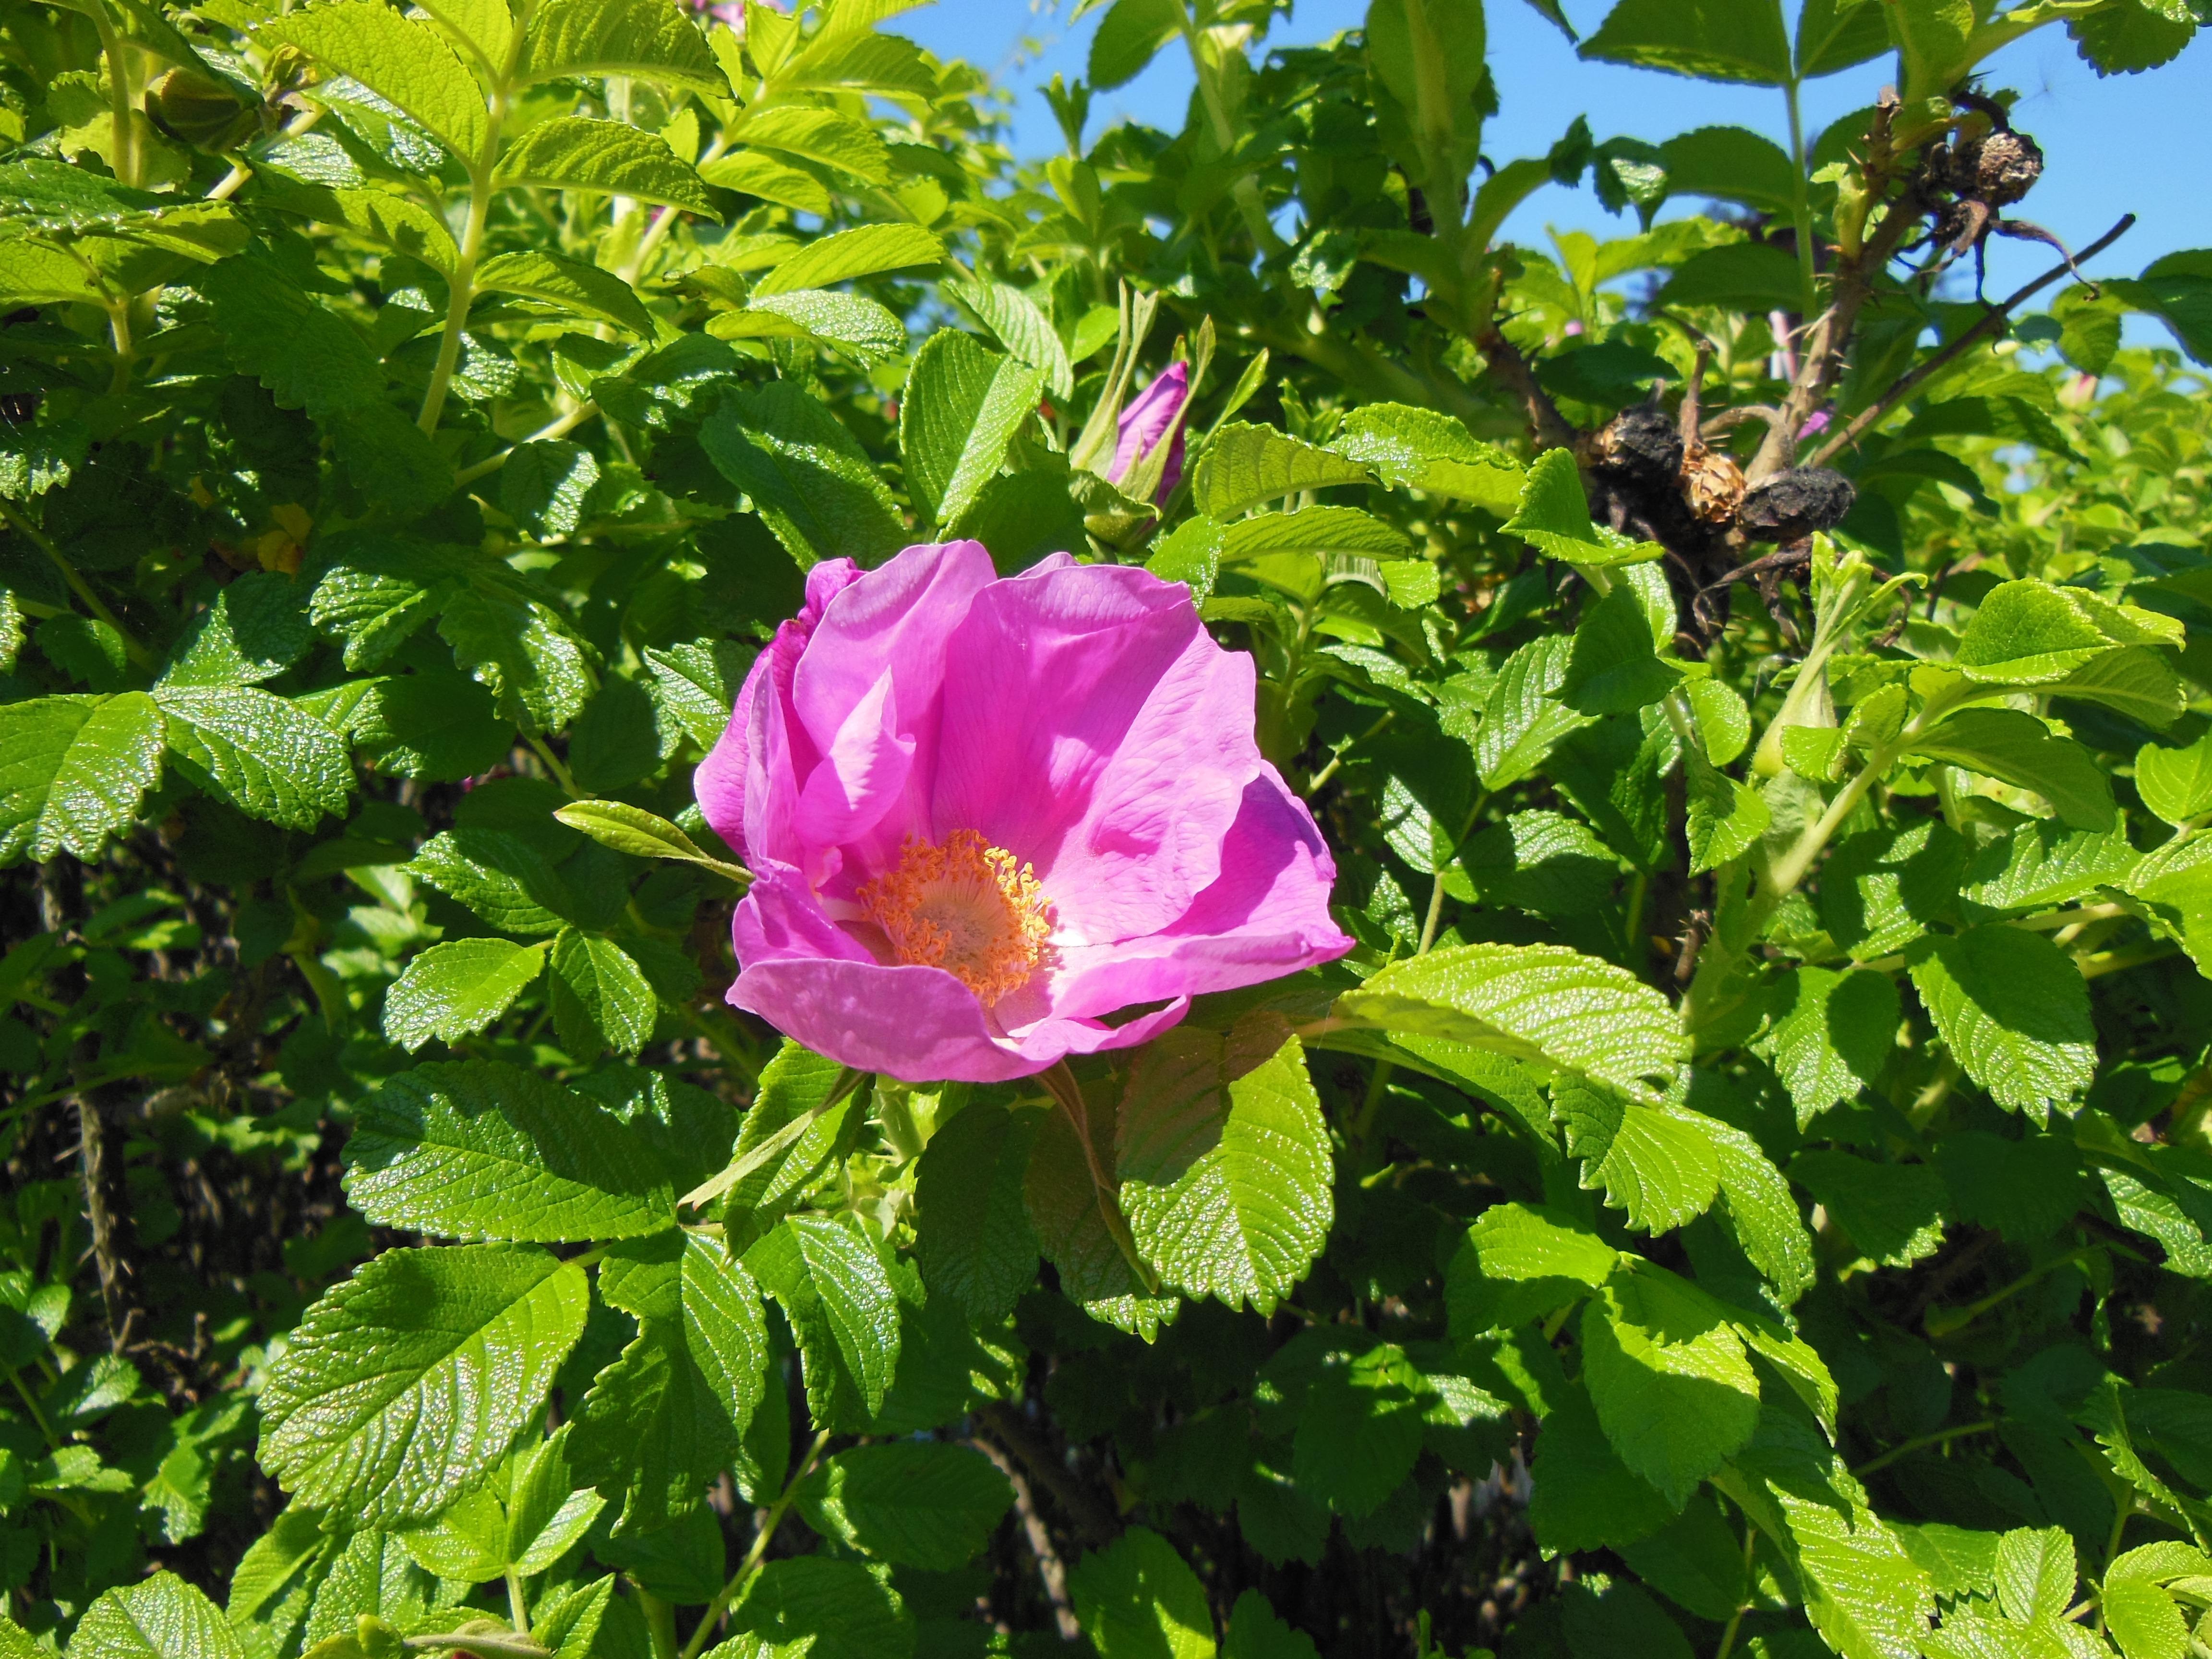 Free Images Nature Blossom Sunshine Green Botany Garden